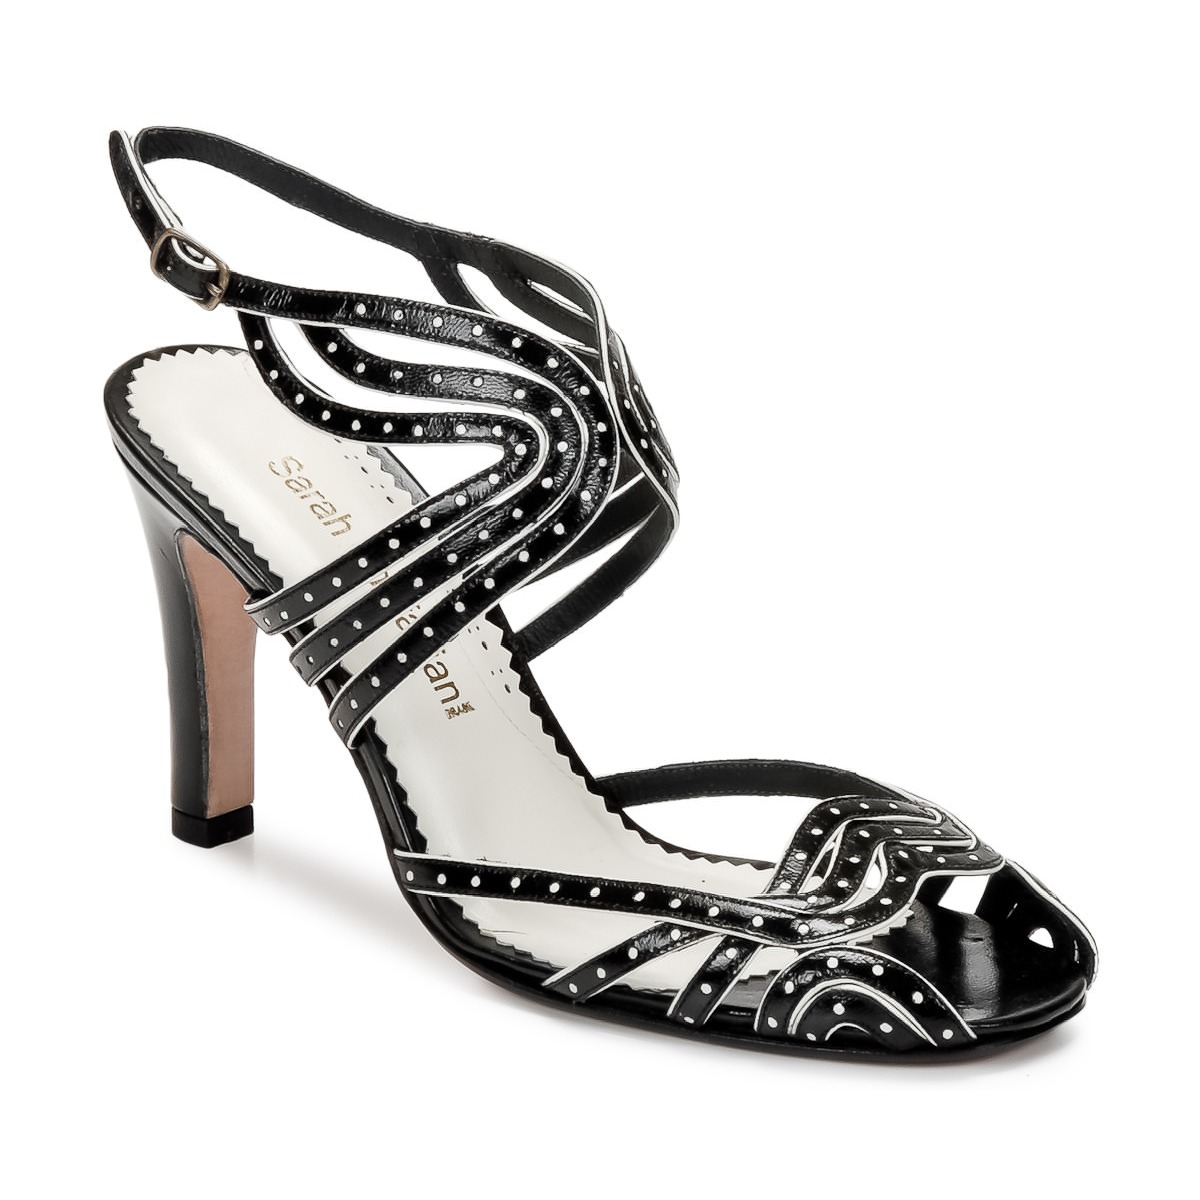 Sandale Sarah Chofakian WINGS Noir / Or